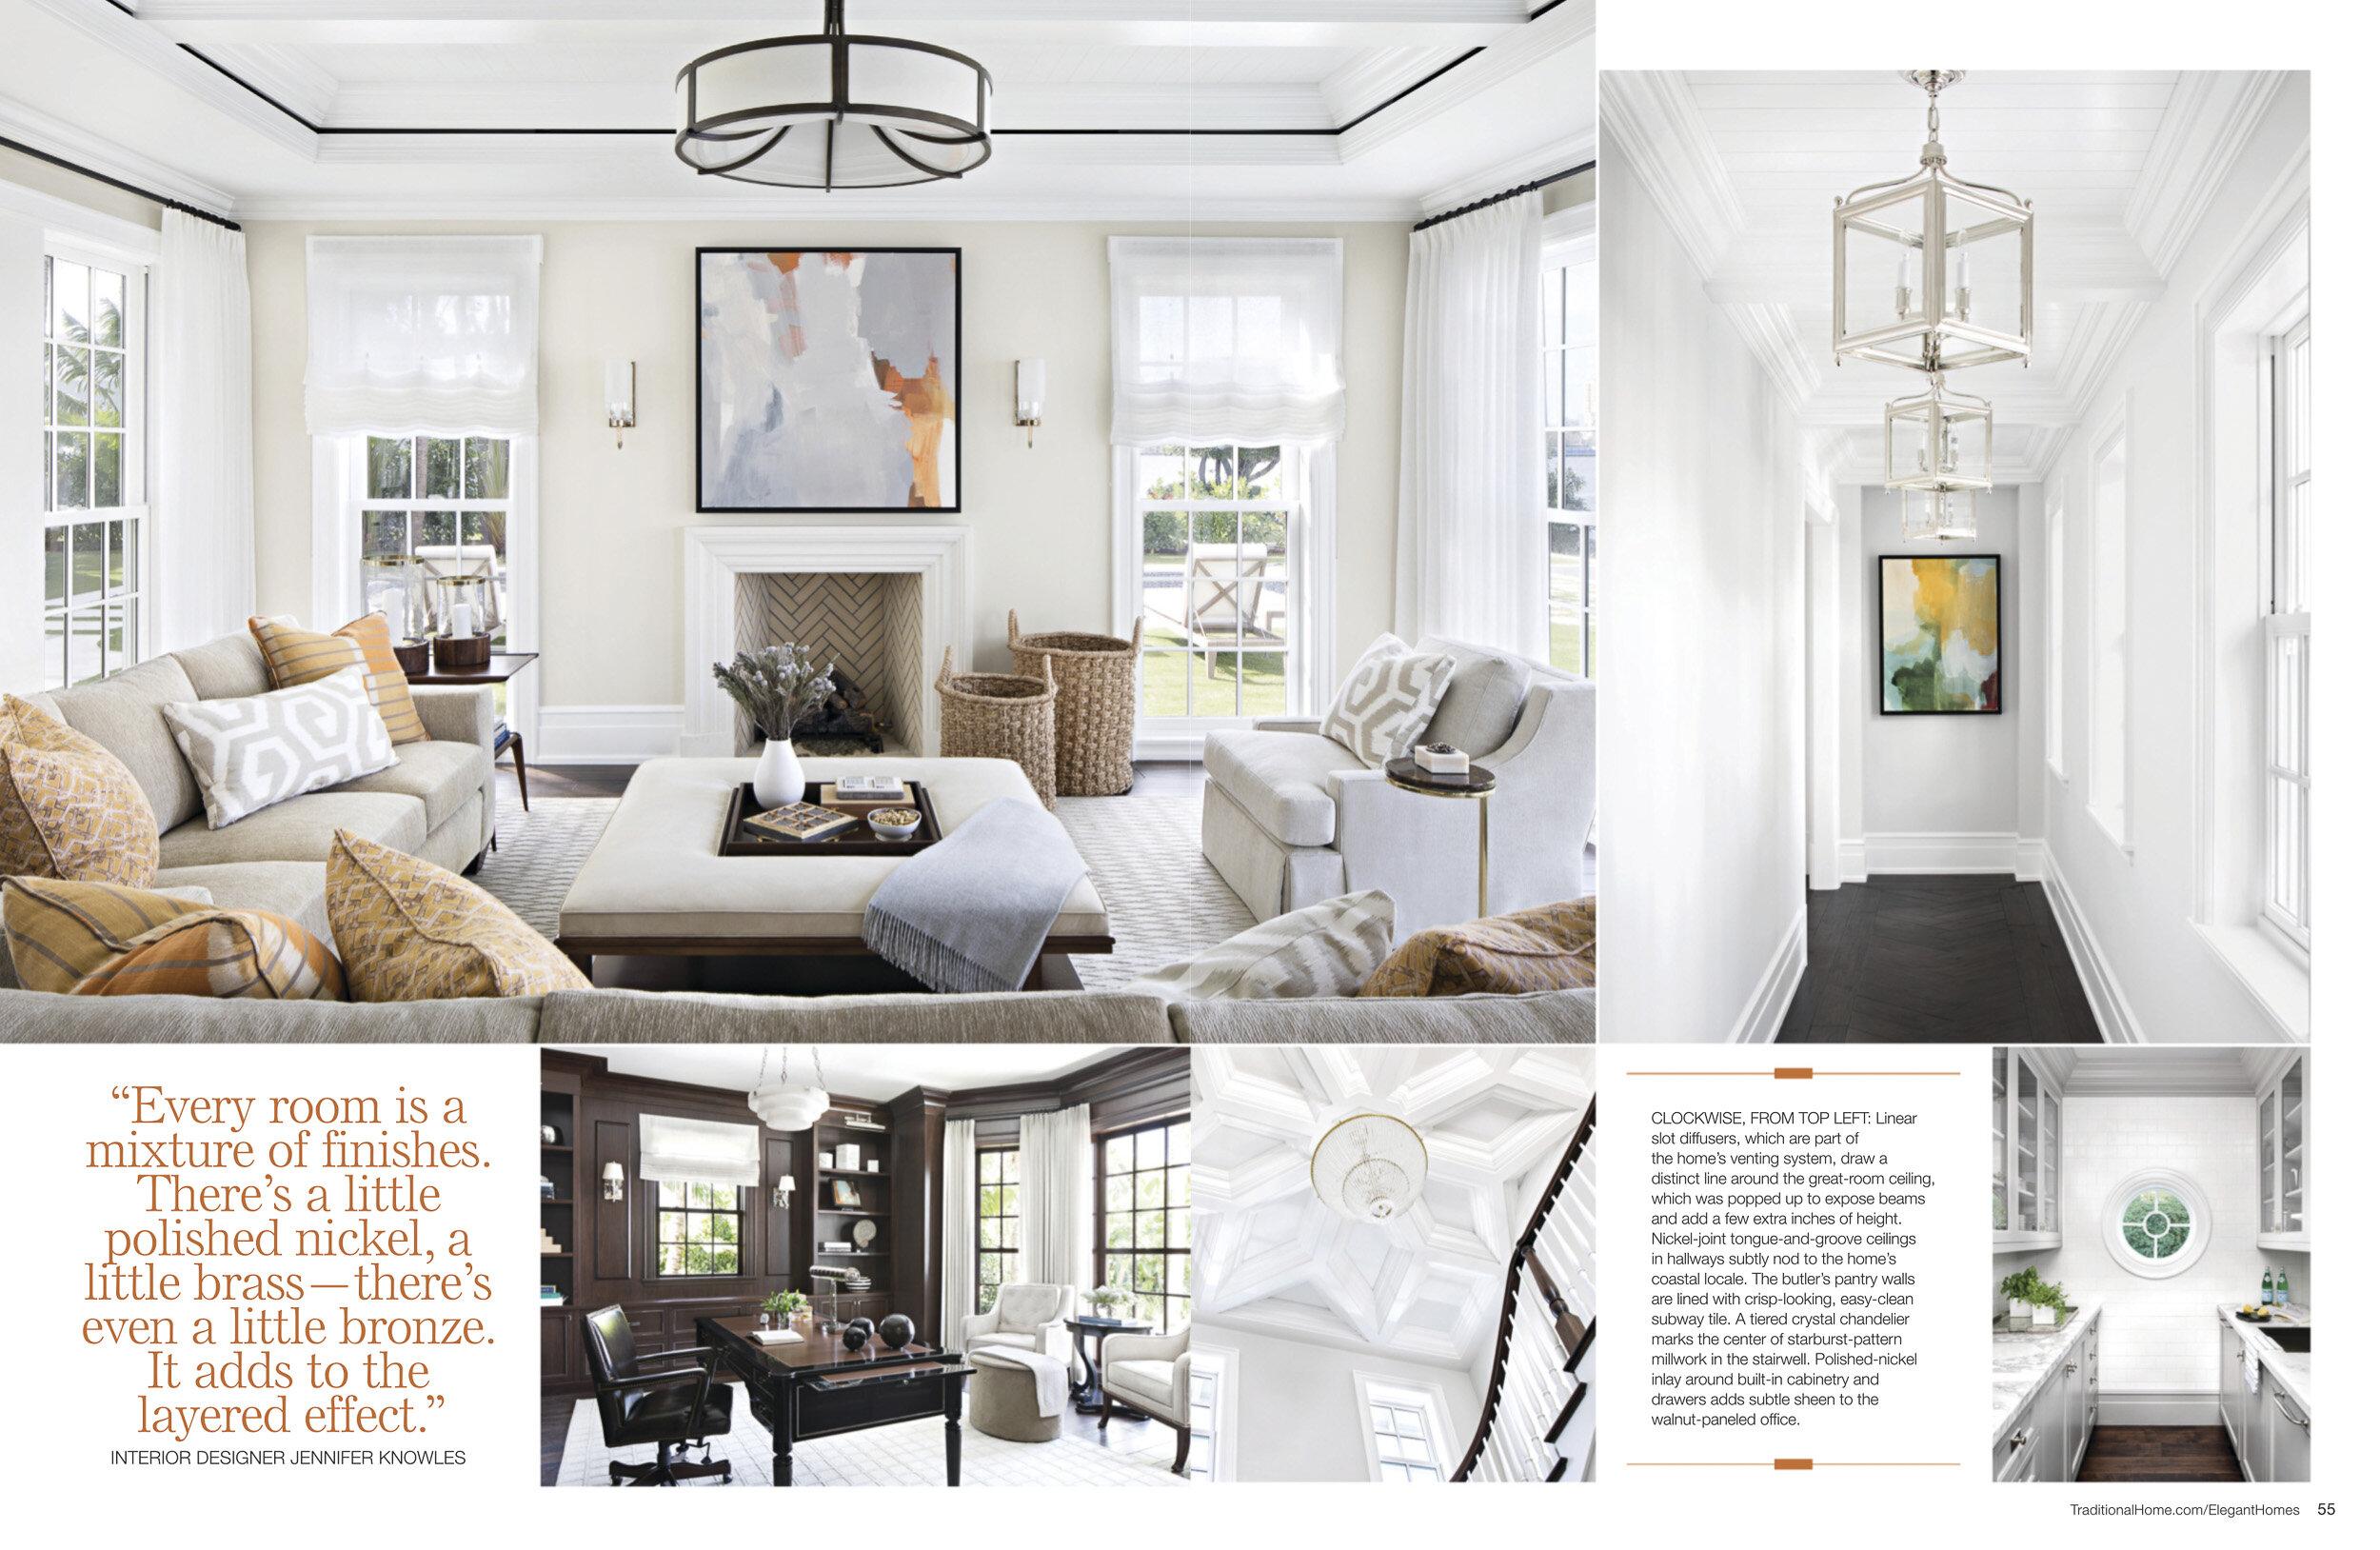 knowles-design-media-elegant-homes-fall-2019-feature-spread-04.jpg